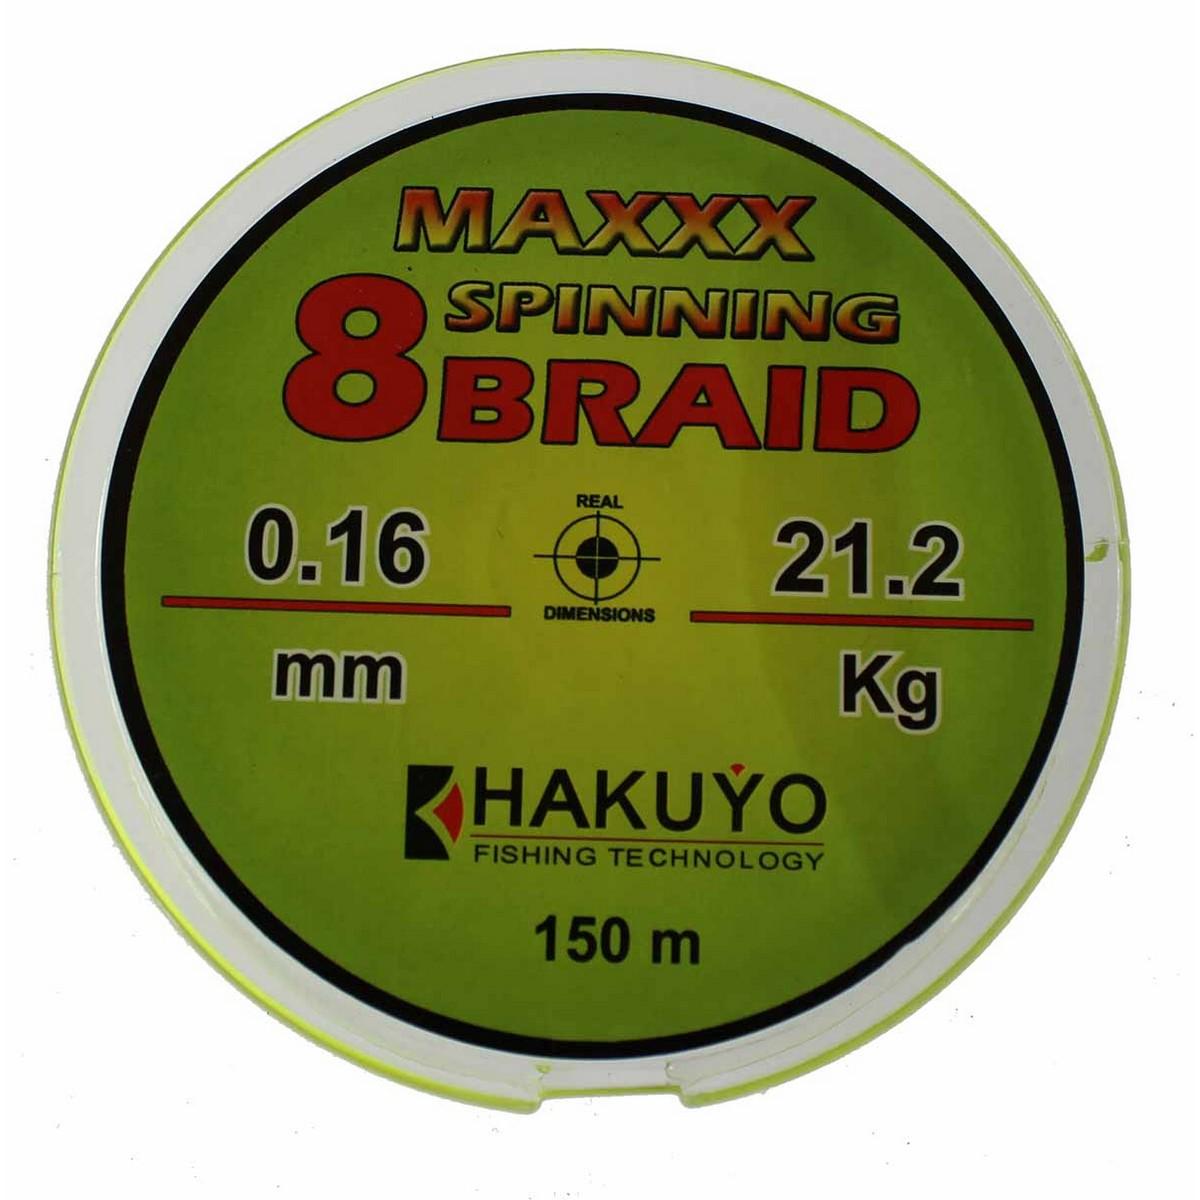 Hakuyo Maxxx Spinning 8 Braid 150m-плетено влакно